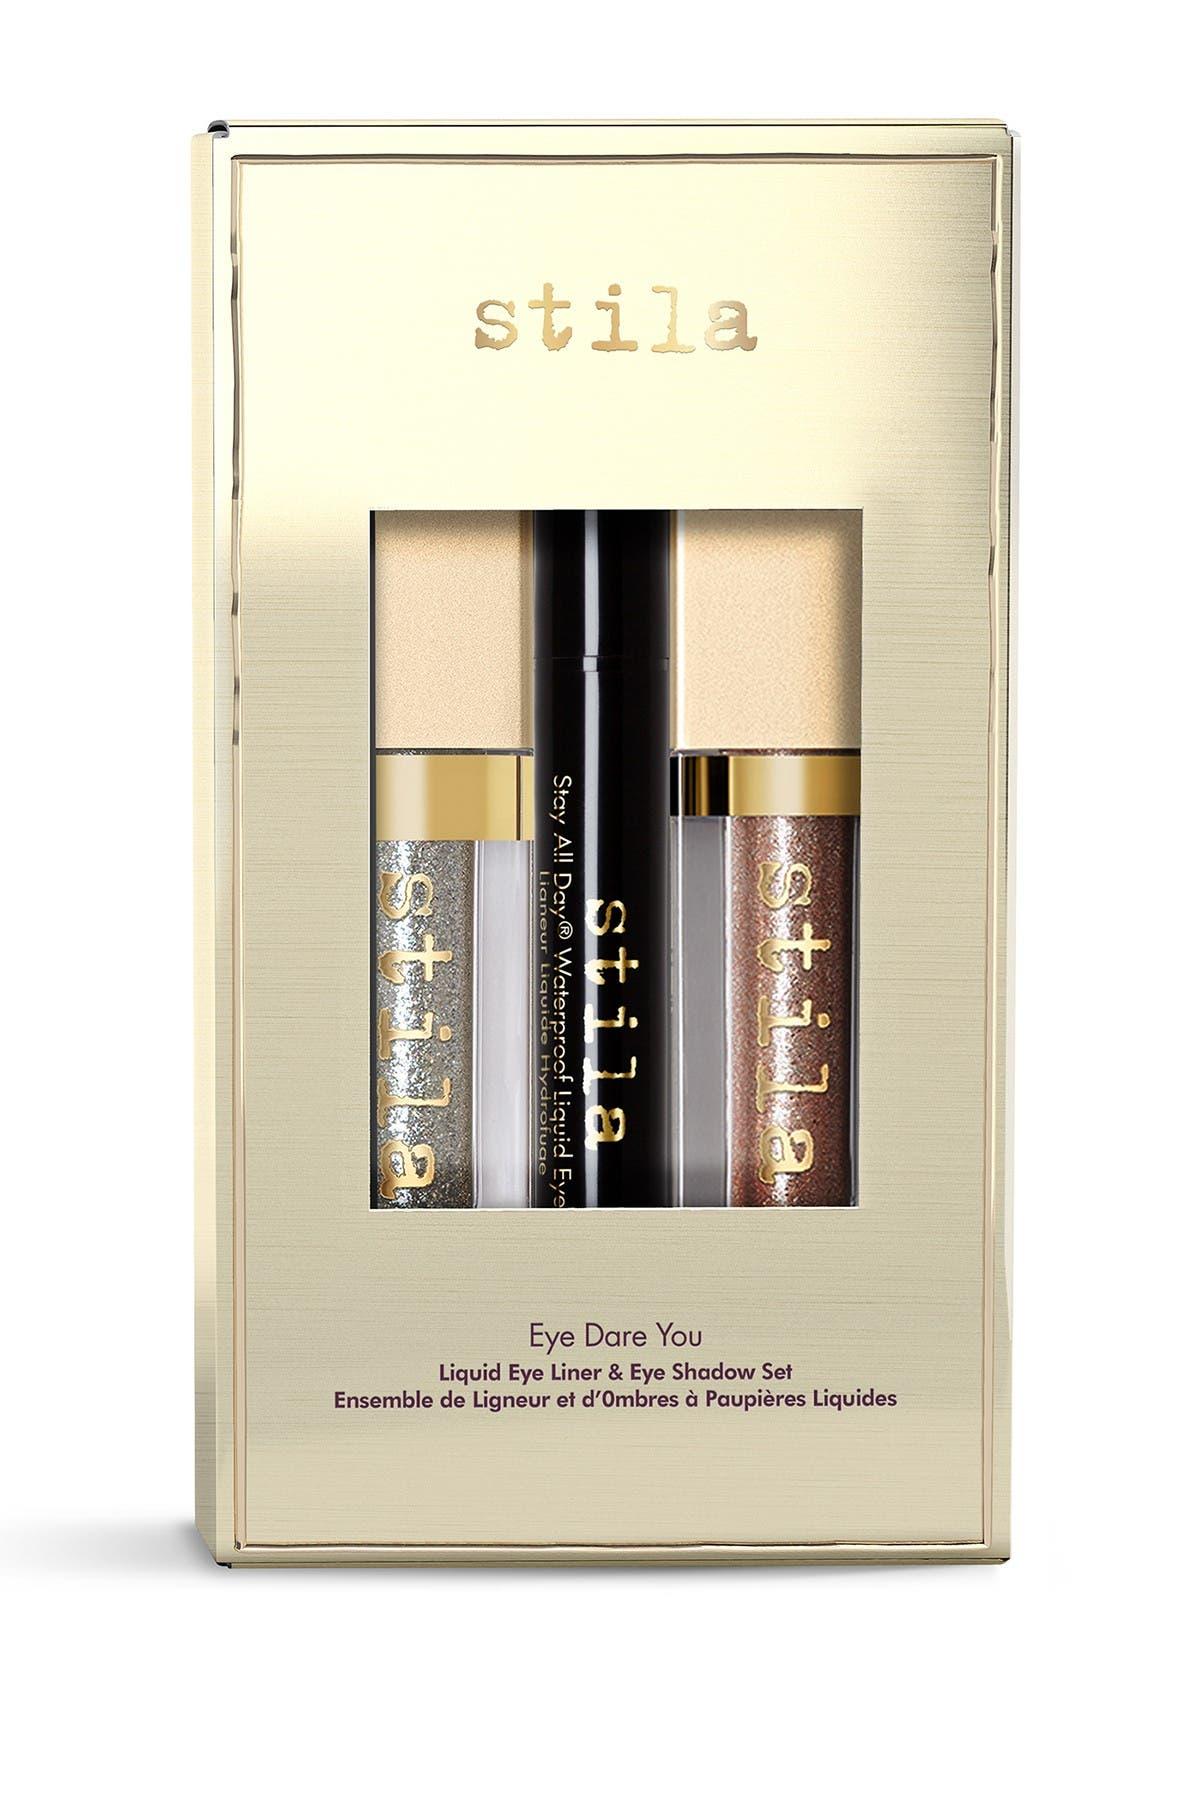 Image of Stila Eye Dare You 3-Piece Liquid Eyeliner & Eyeshadow Set